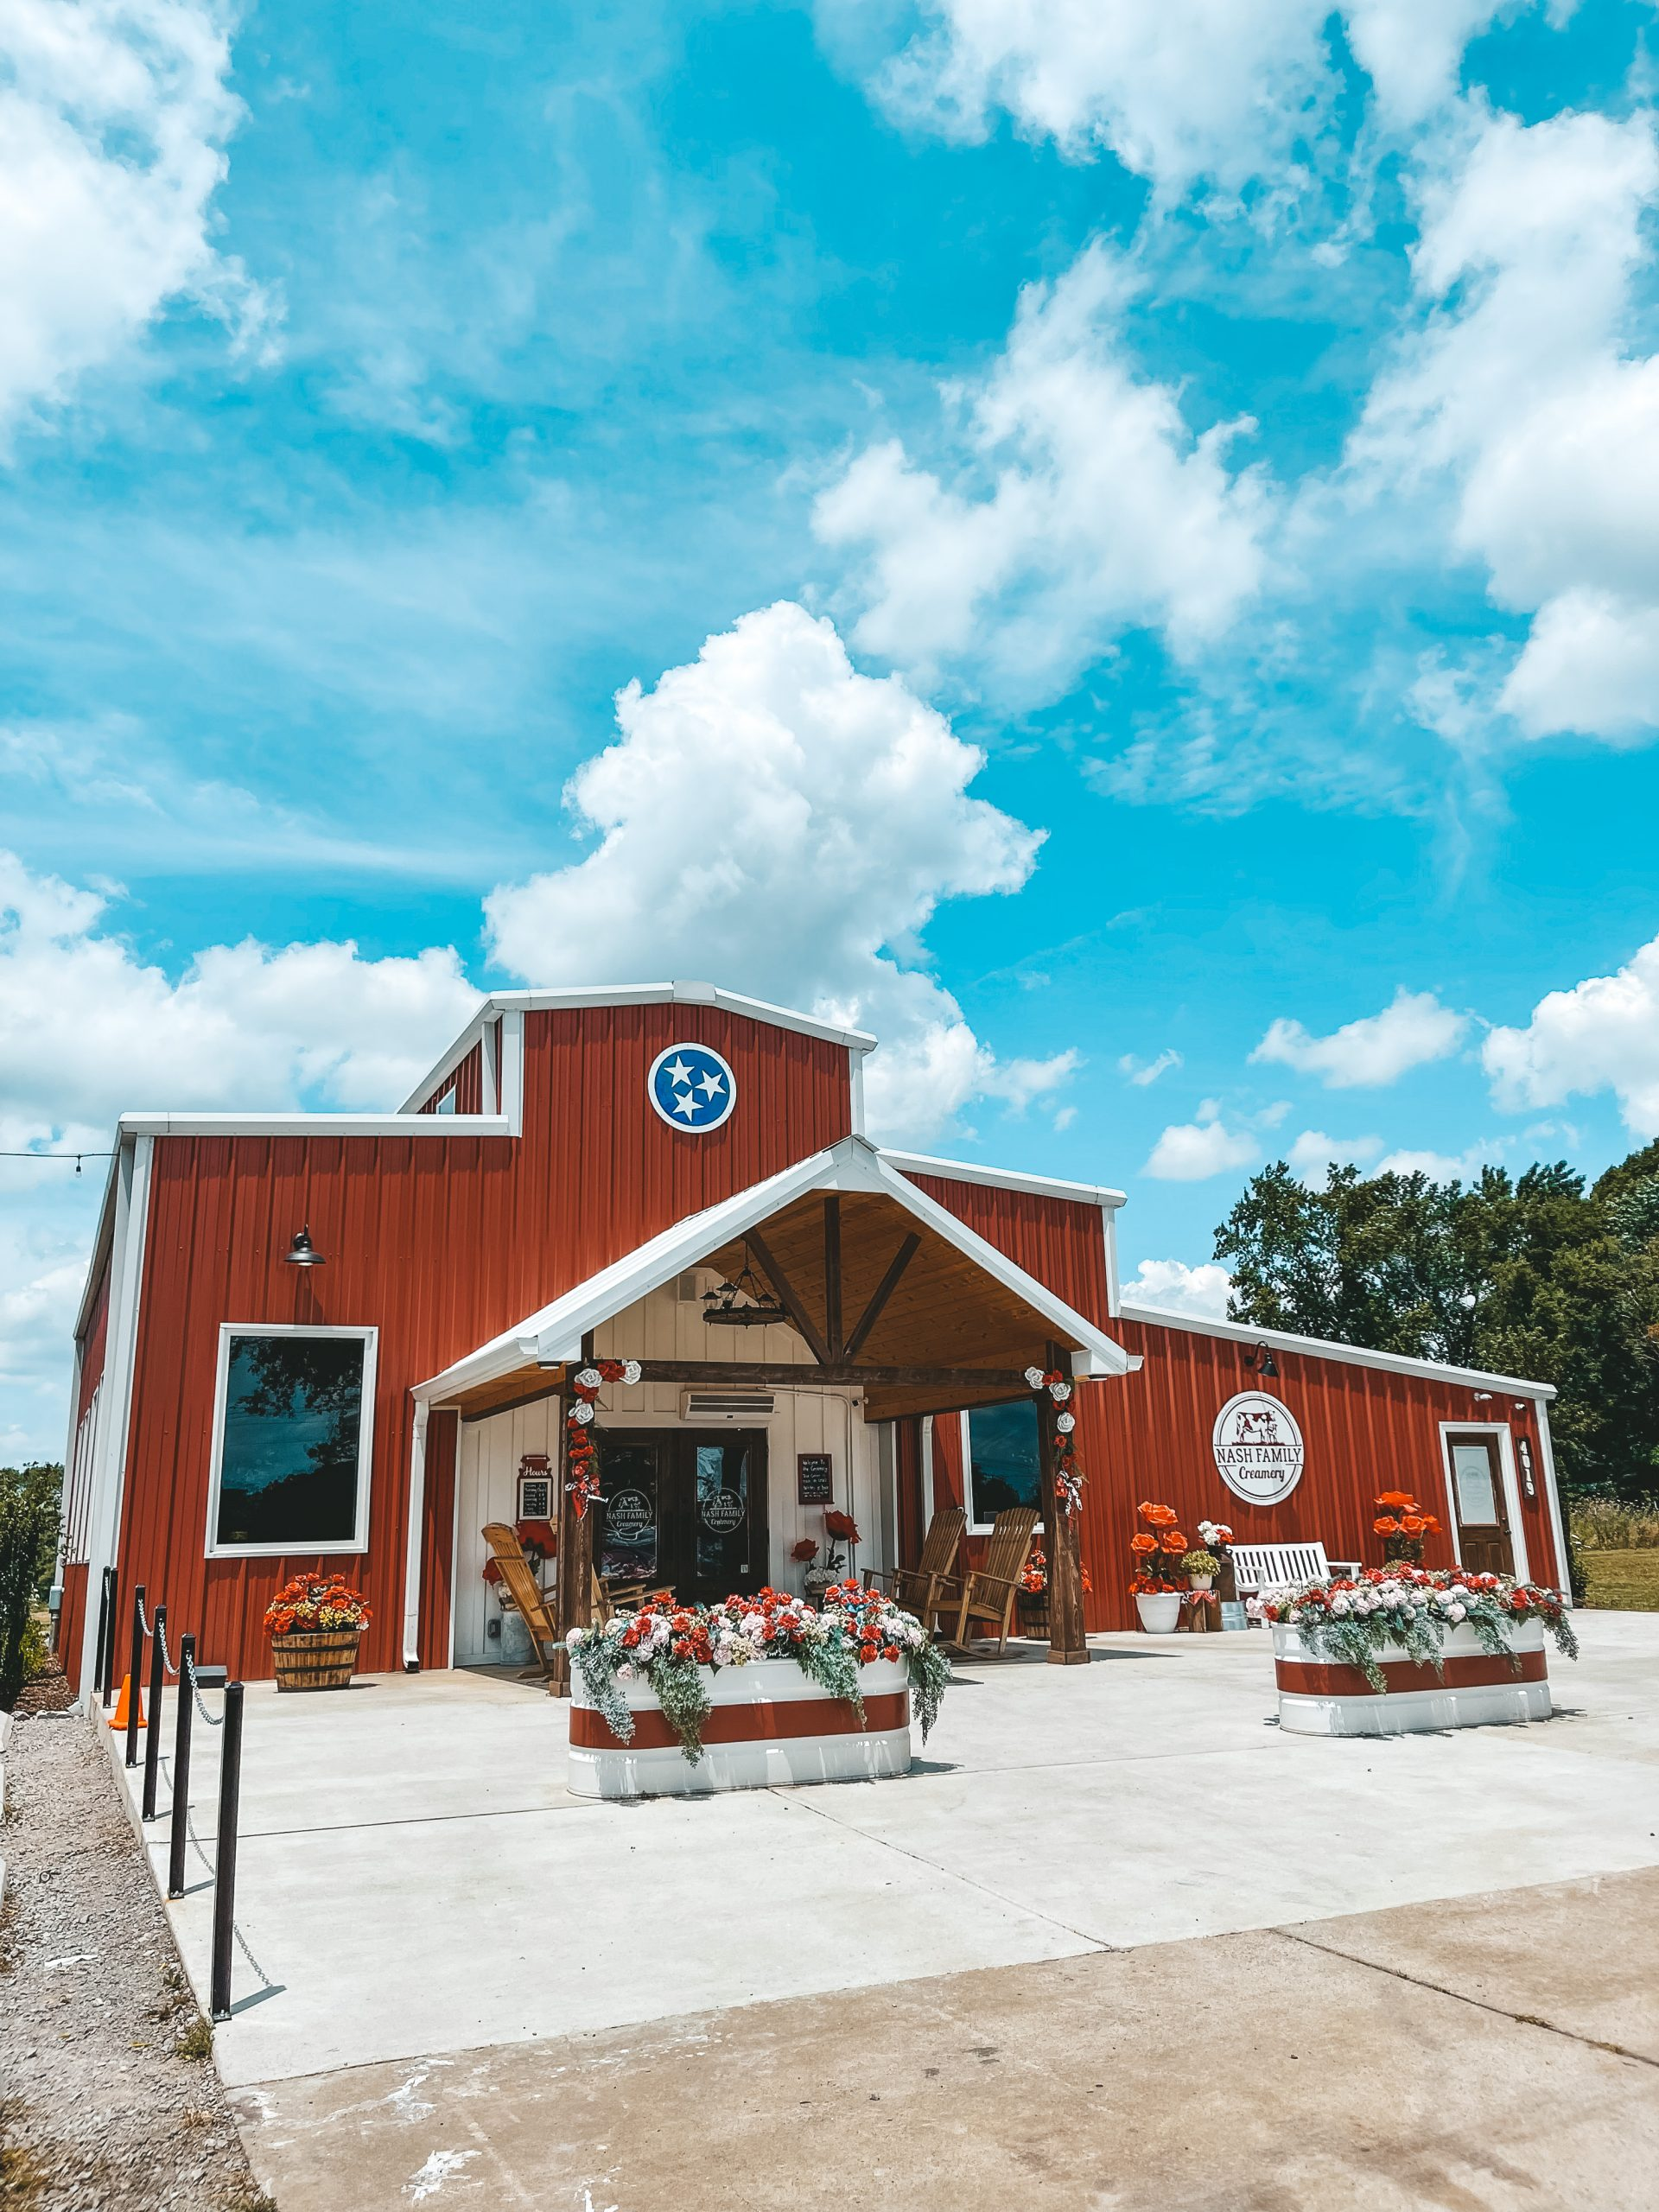 Nash Family Creamery Chapel Hill, TN Angela Lanter travel guide Nashville